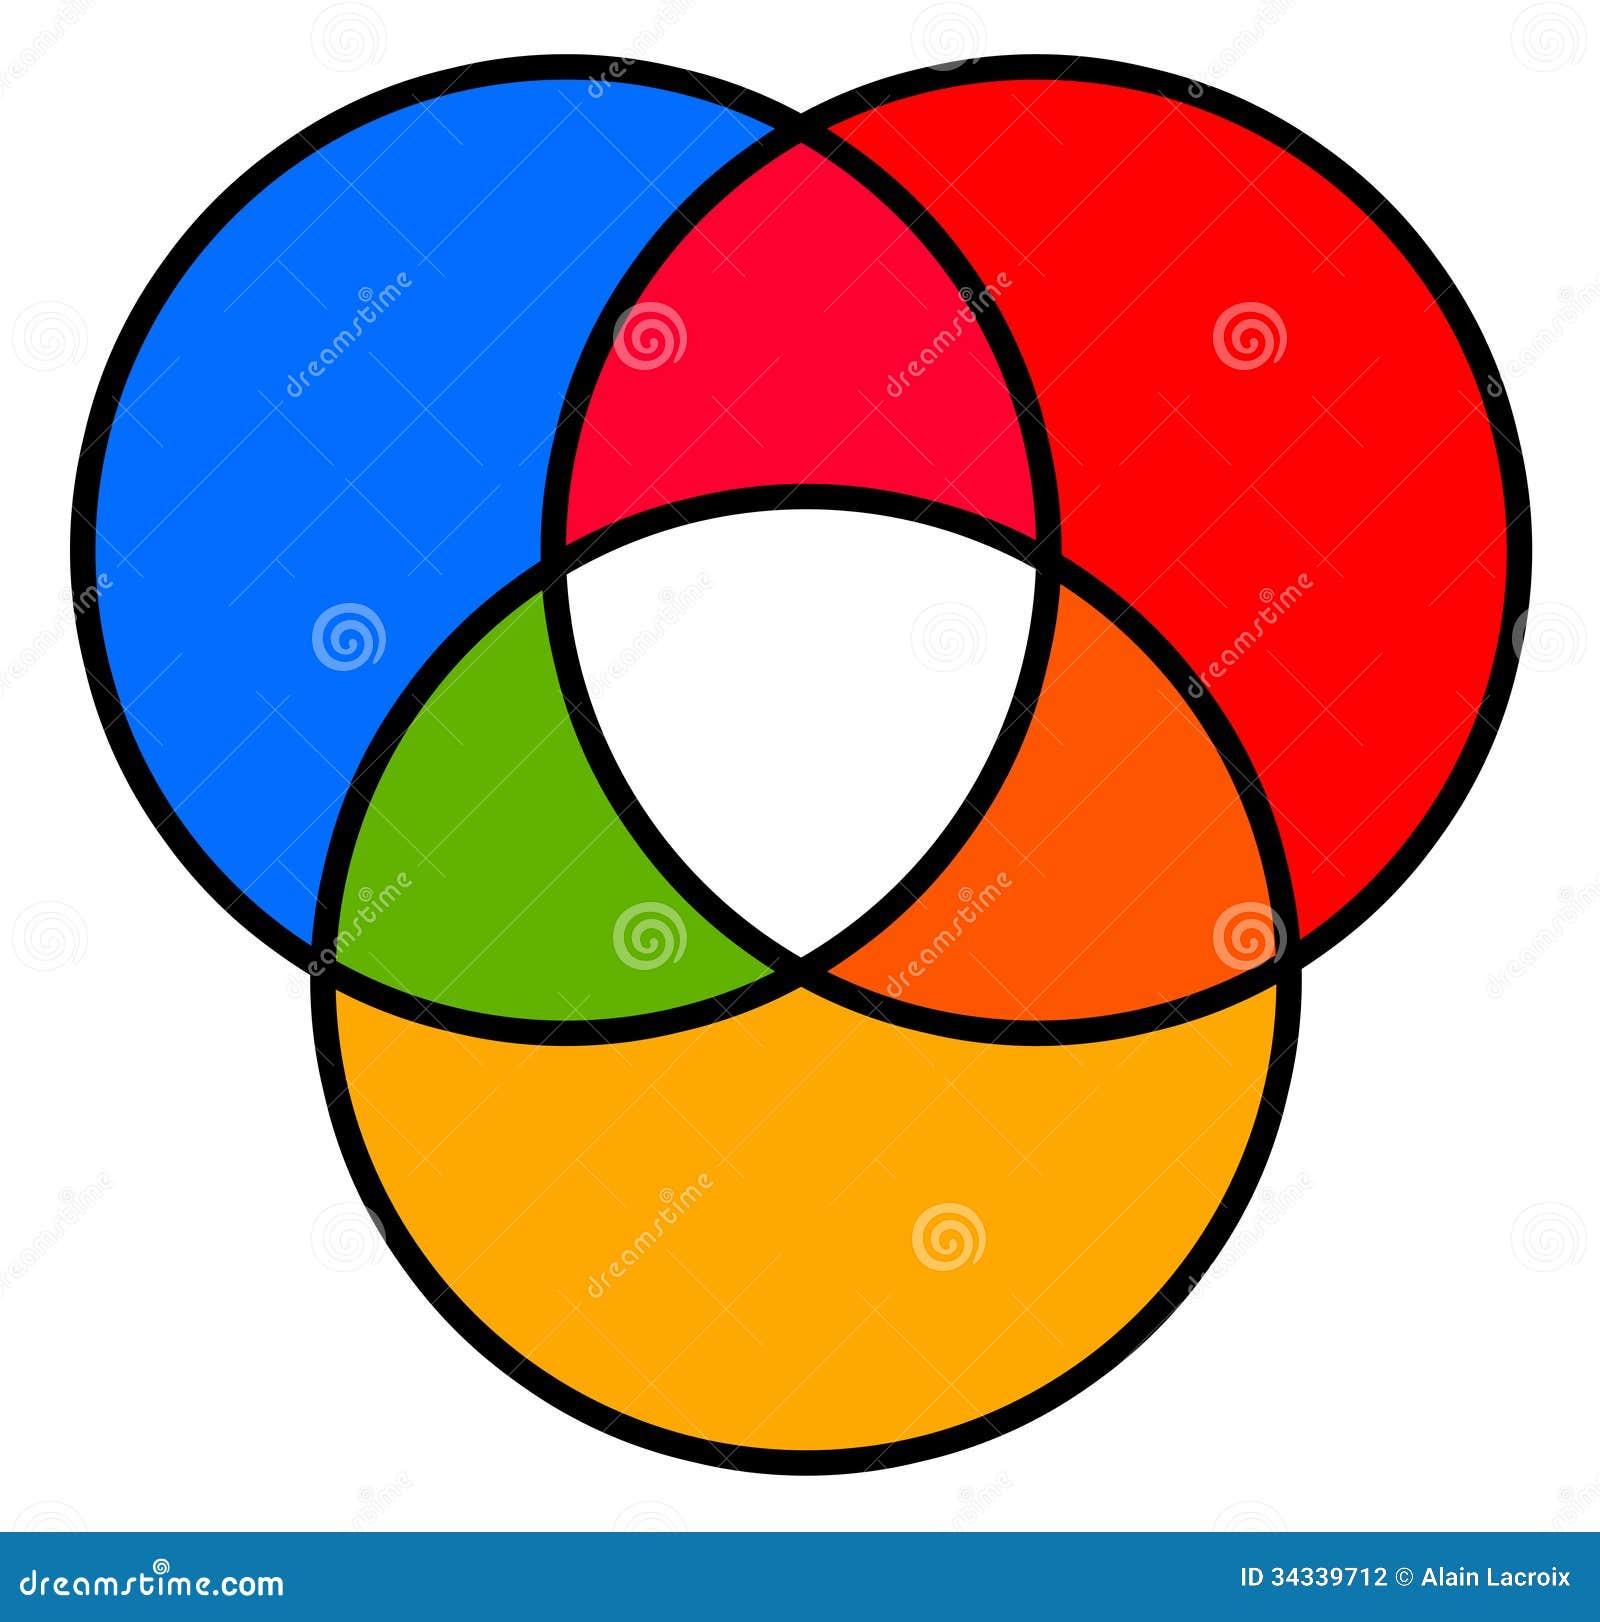 Venn diagram stock illustration illustration of analyze 34339712 venn diagram pooptronica Choice Image